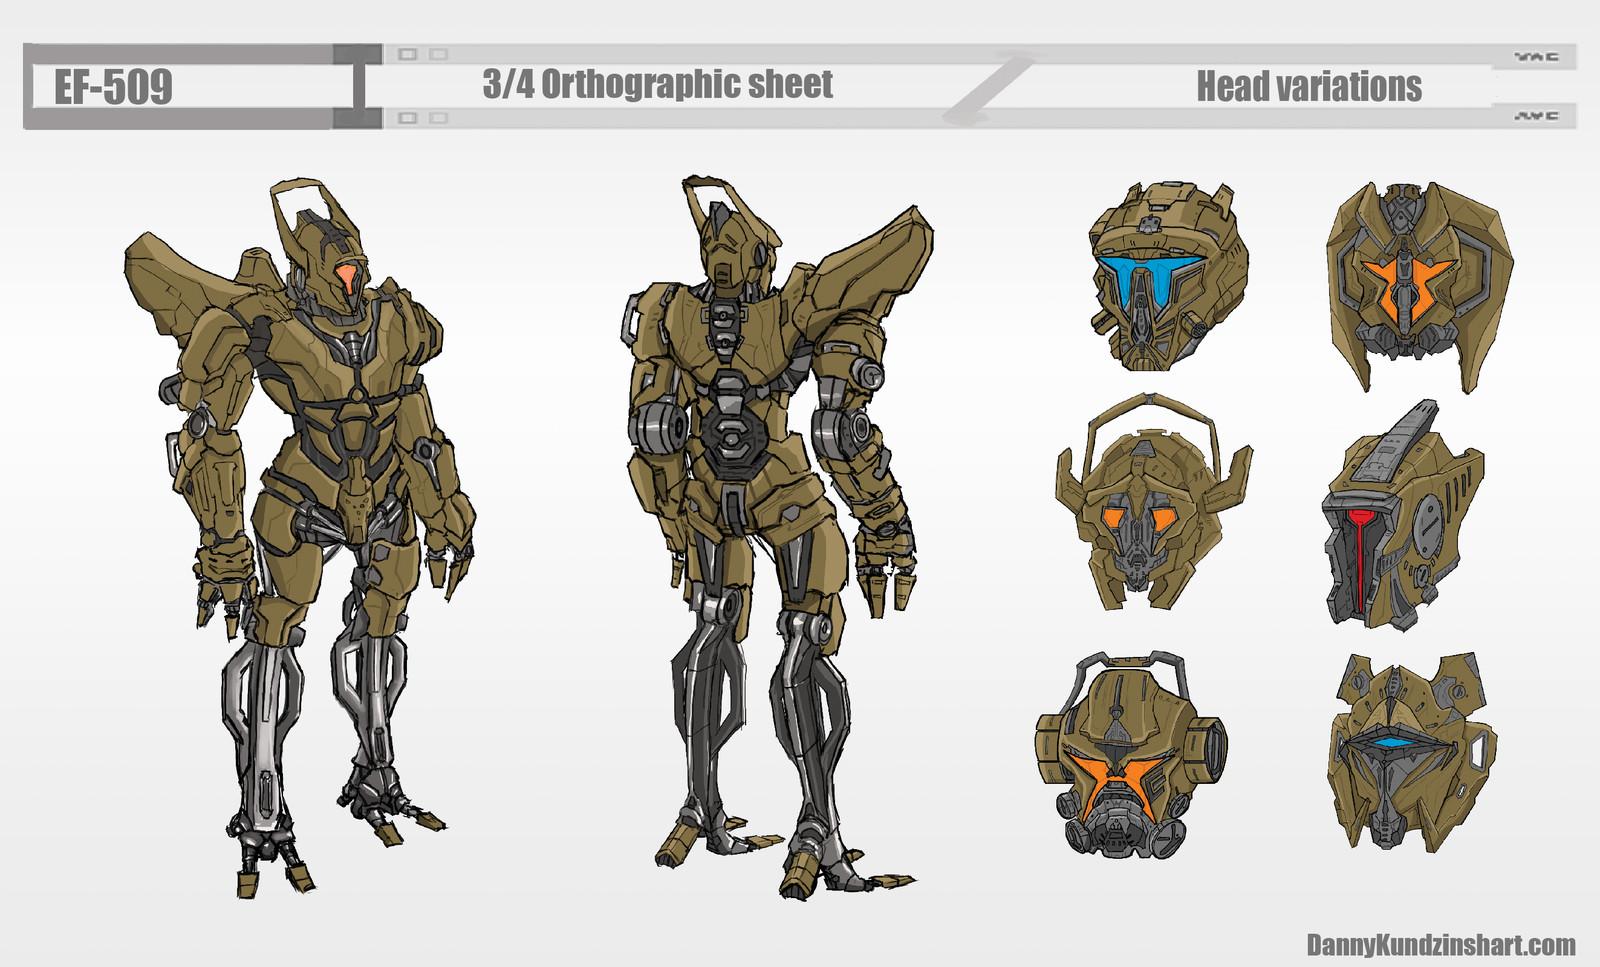 Humanoid Robot EF-509 concept design